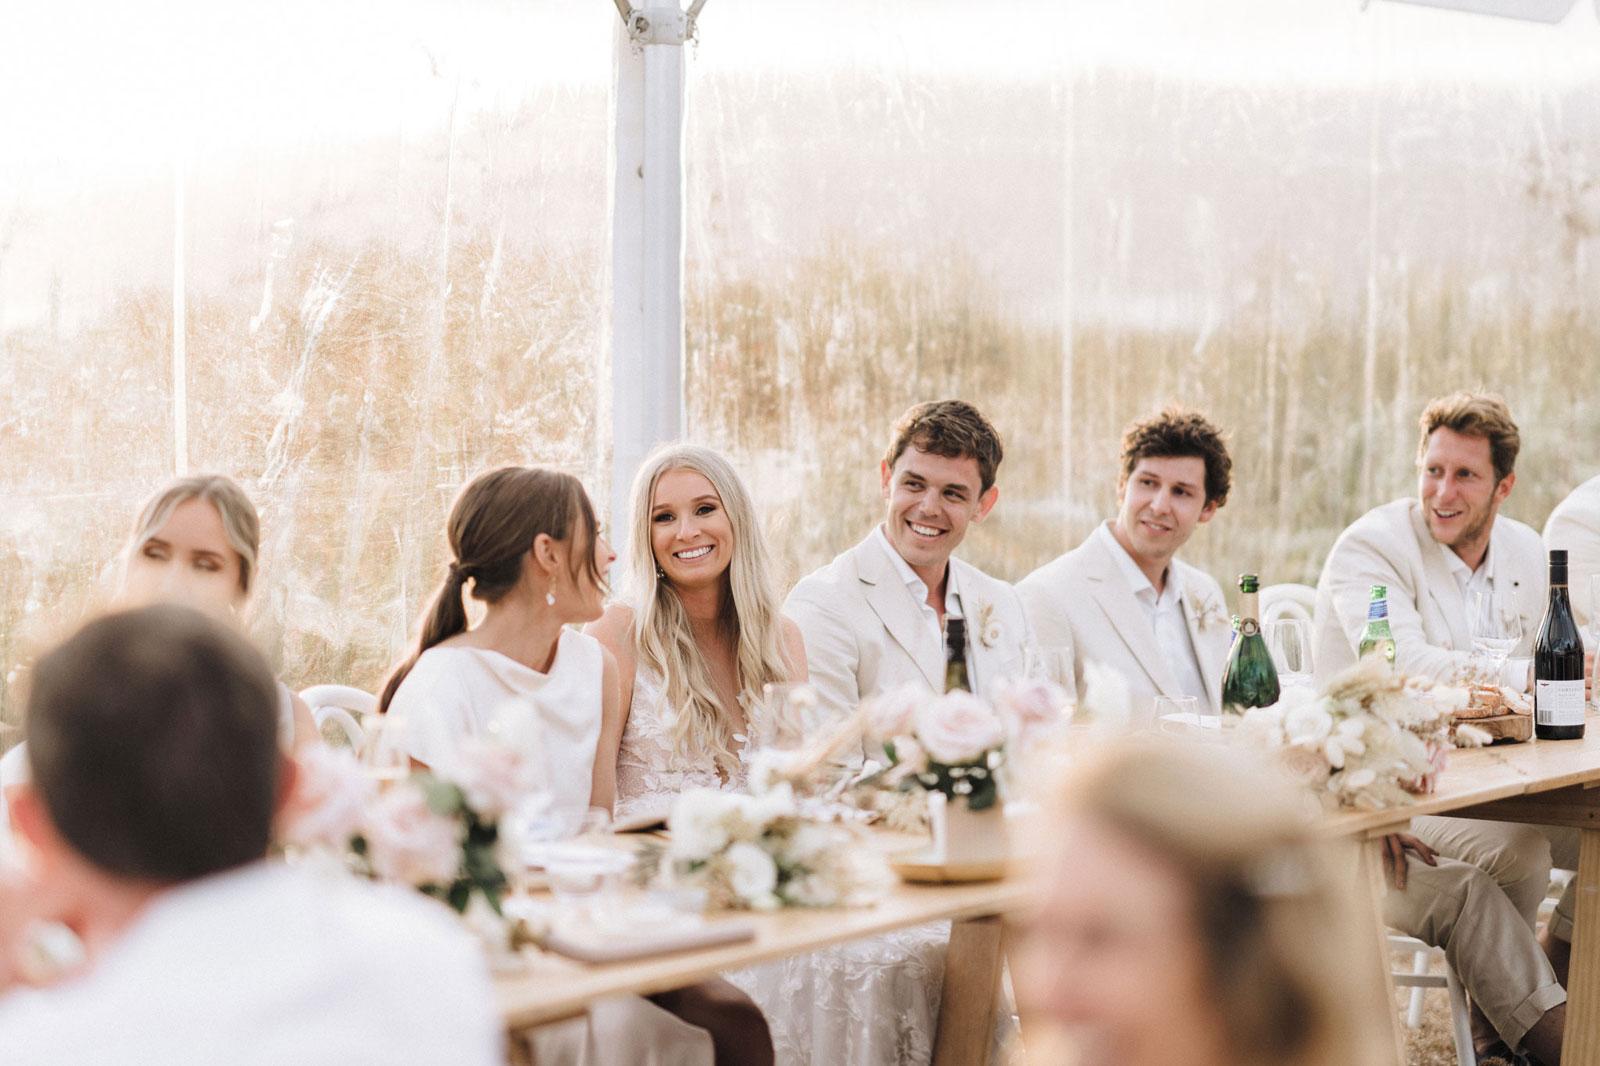 newfound-k-b-coromandel-wedding-photographers-118